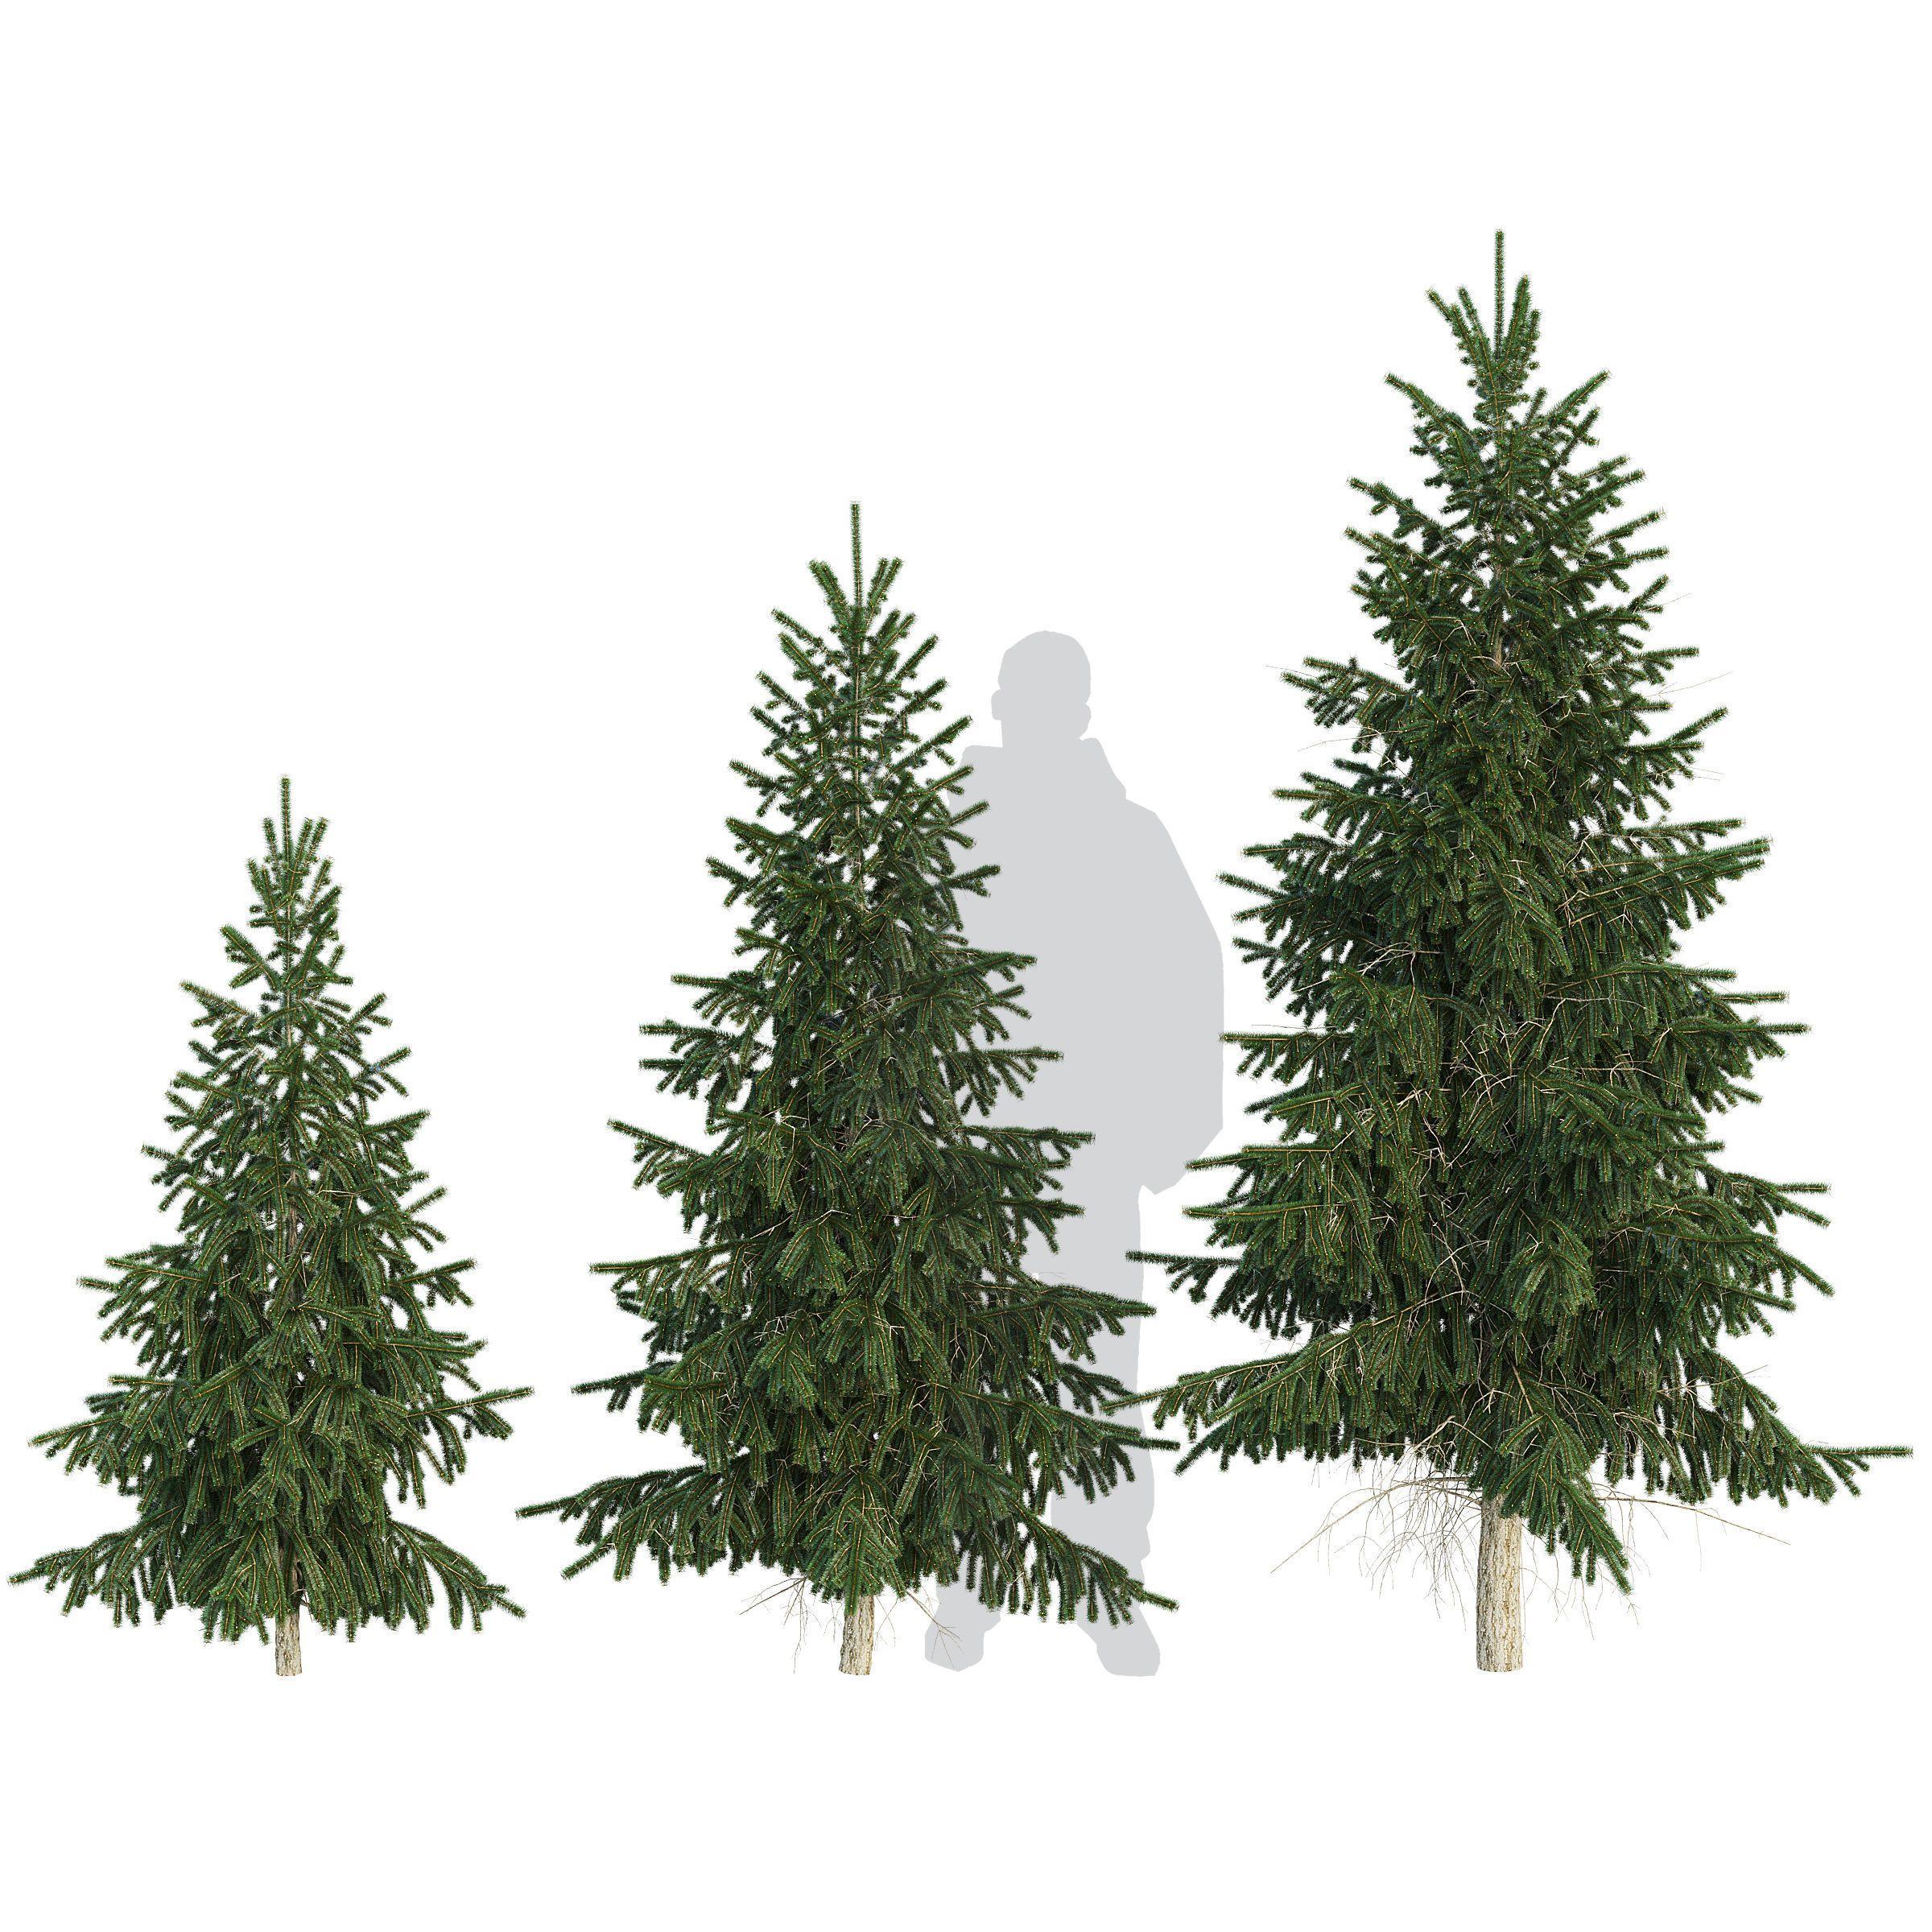 Spruce Tree 3d Model Spruce Tree 3d Model Tree